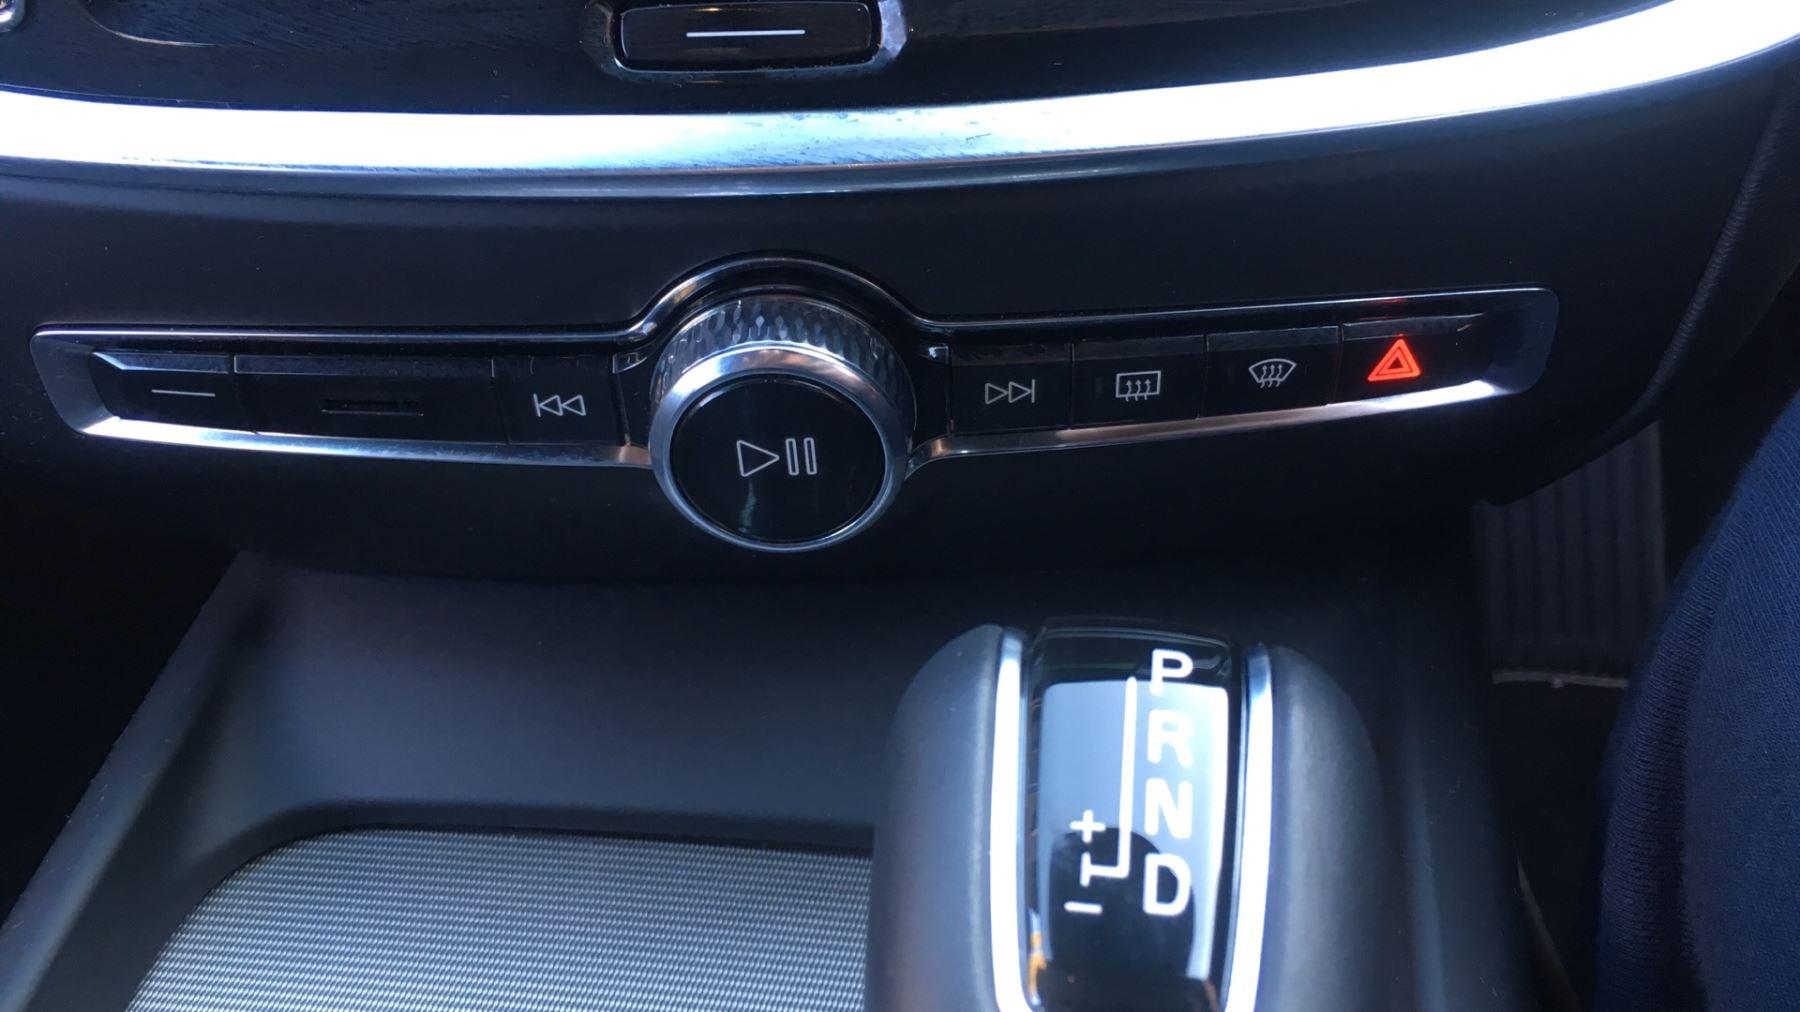 Volvo V60 2.0 D4 [190] R DESIGN 5dr - Volvo on Call, DAB Radio, SAT NAV, Park Assist image 25